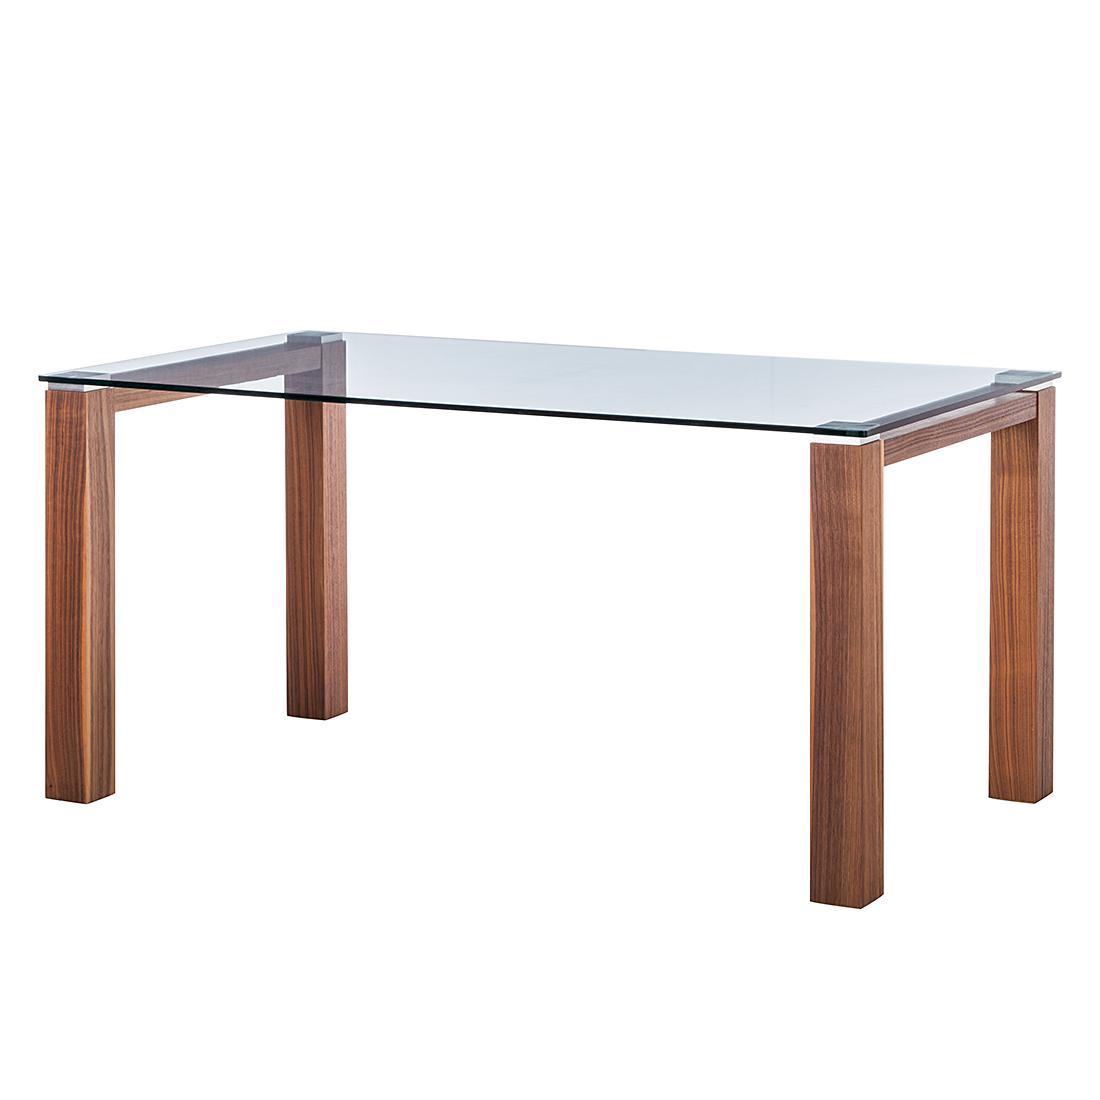 Niehoff Glazen tafel Palma - transparant glas/wild notenboomhout fineer (Afmetingen: 200x100cm) Home24